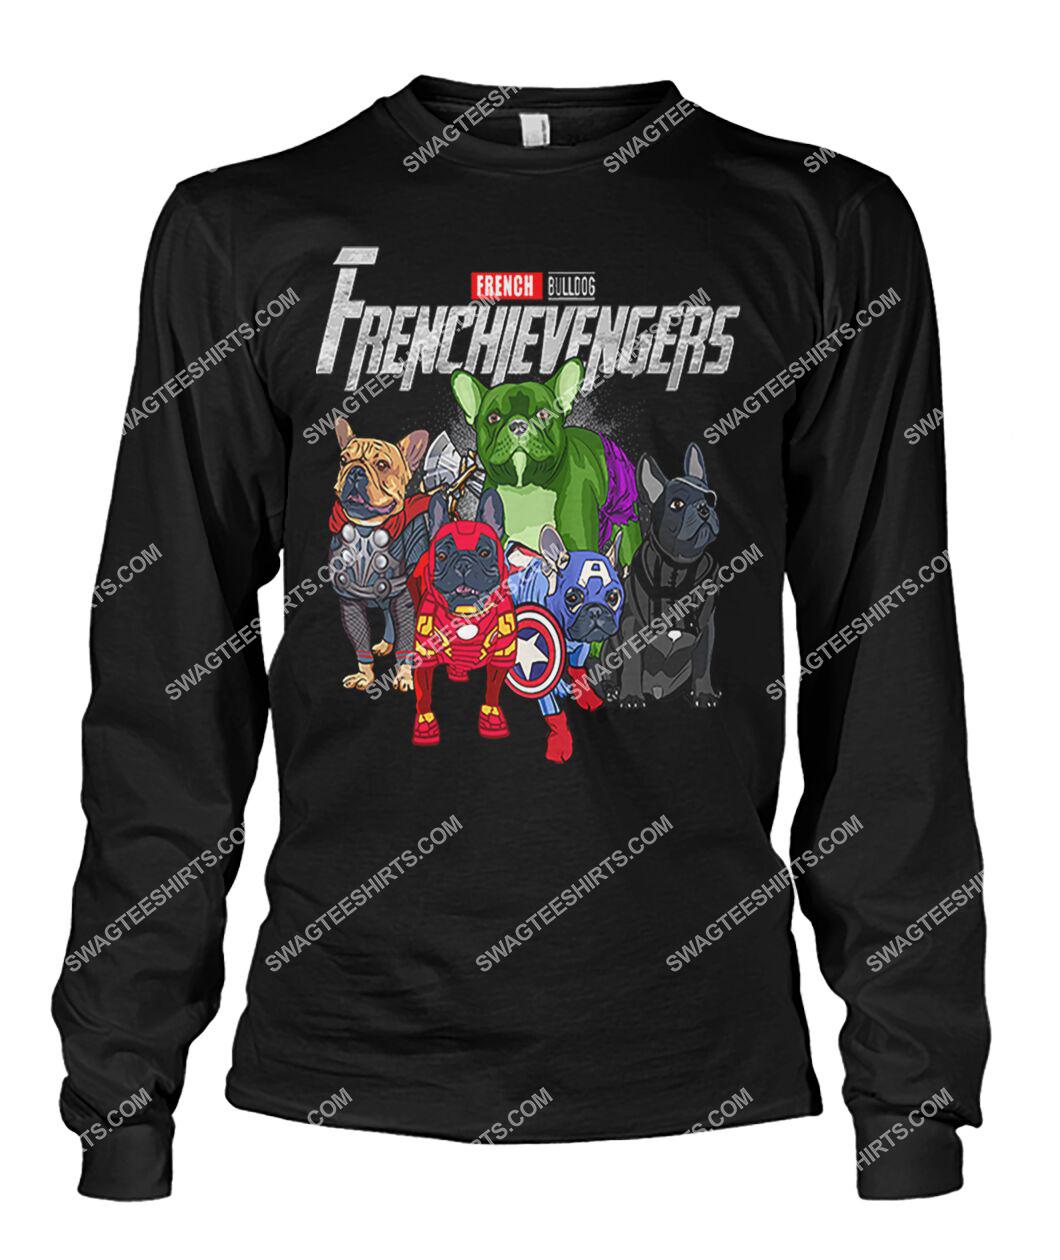 french bulldog frenchievengers marvel avengers dogs lover sweatshirt 1